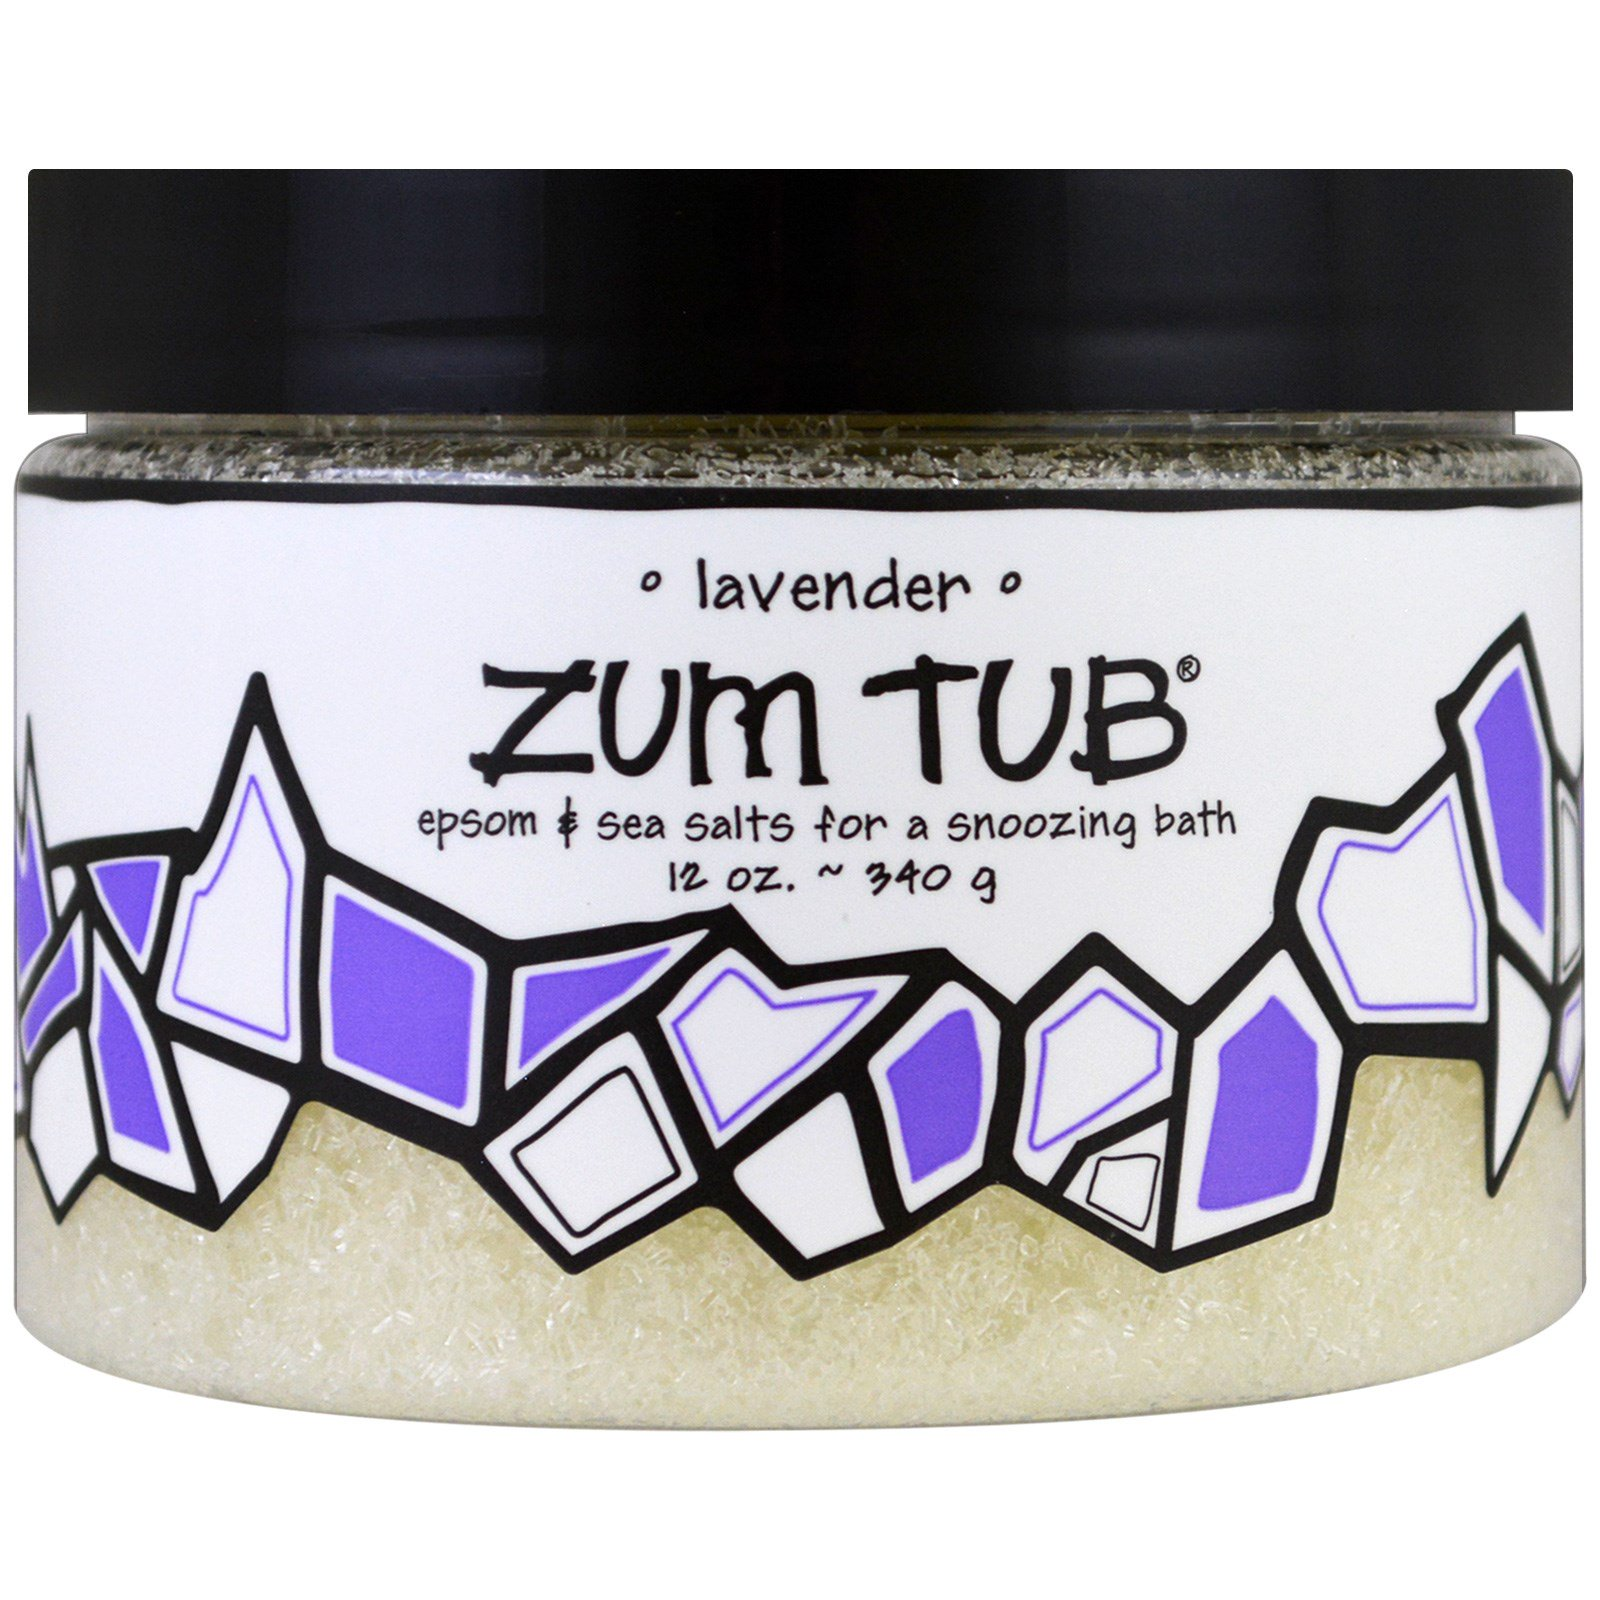 Indigo Wild, Zum Tub, Эпсон и морские соли, лаванда, 12 унц. (340 г)